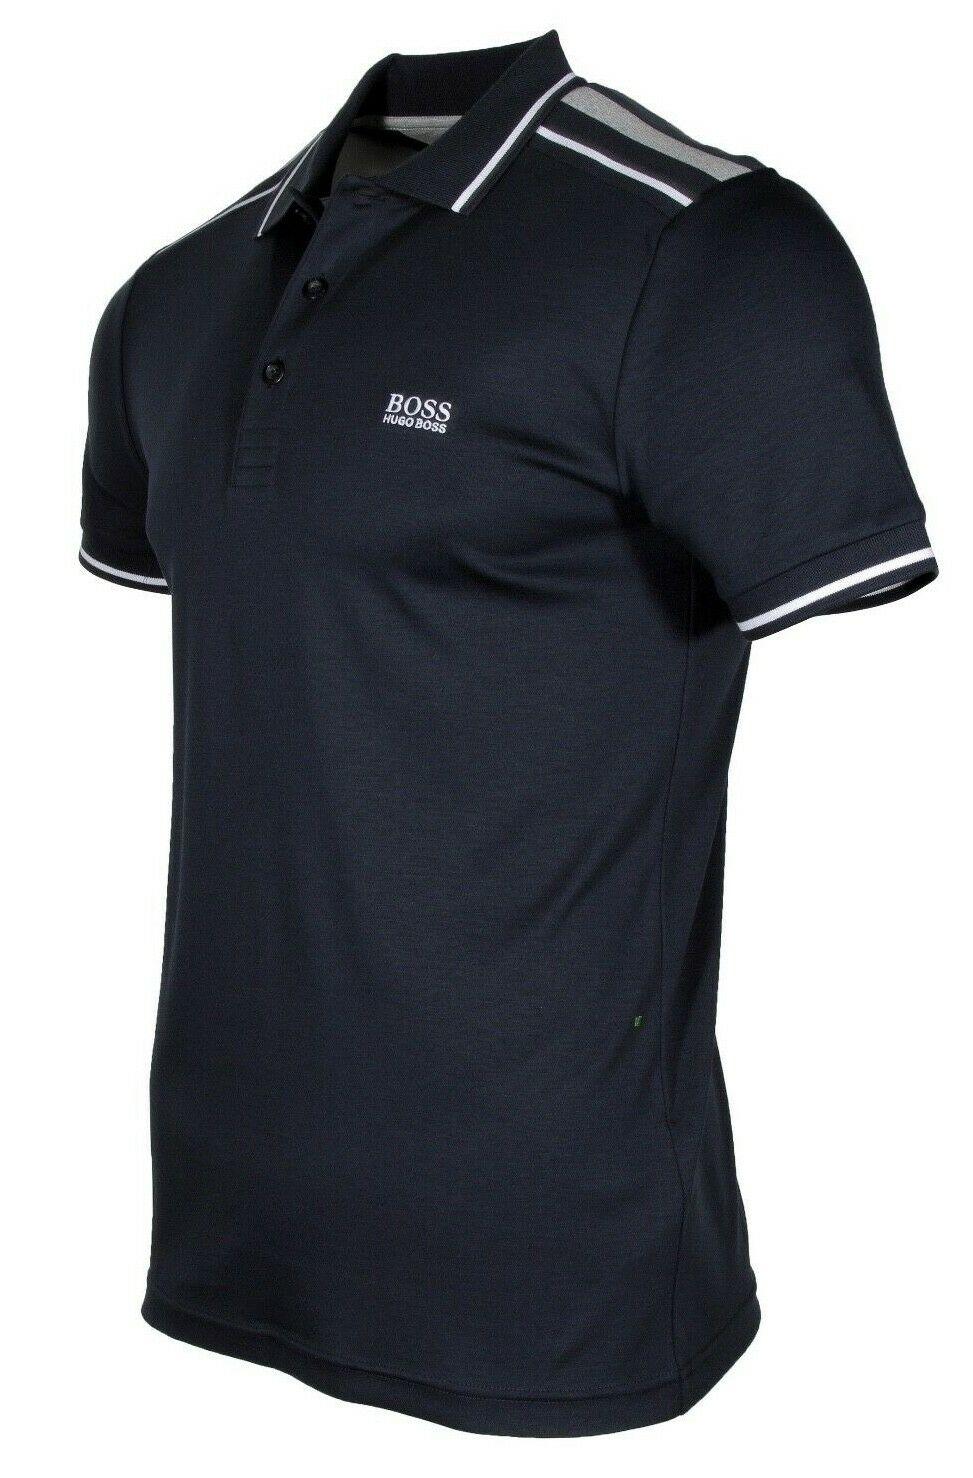 HUGO-BOSS-Paule-1-Men-039-s-Short-Sleeve-Slim-Fit-Polo-Shirt-Navy-50399450-410 thumbnail 5